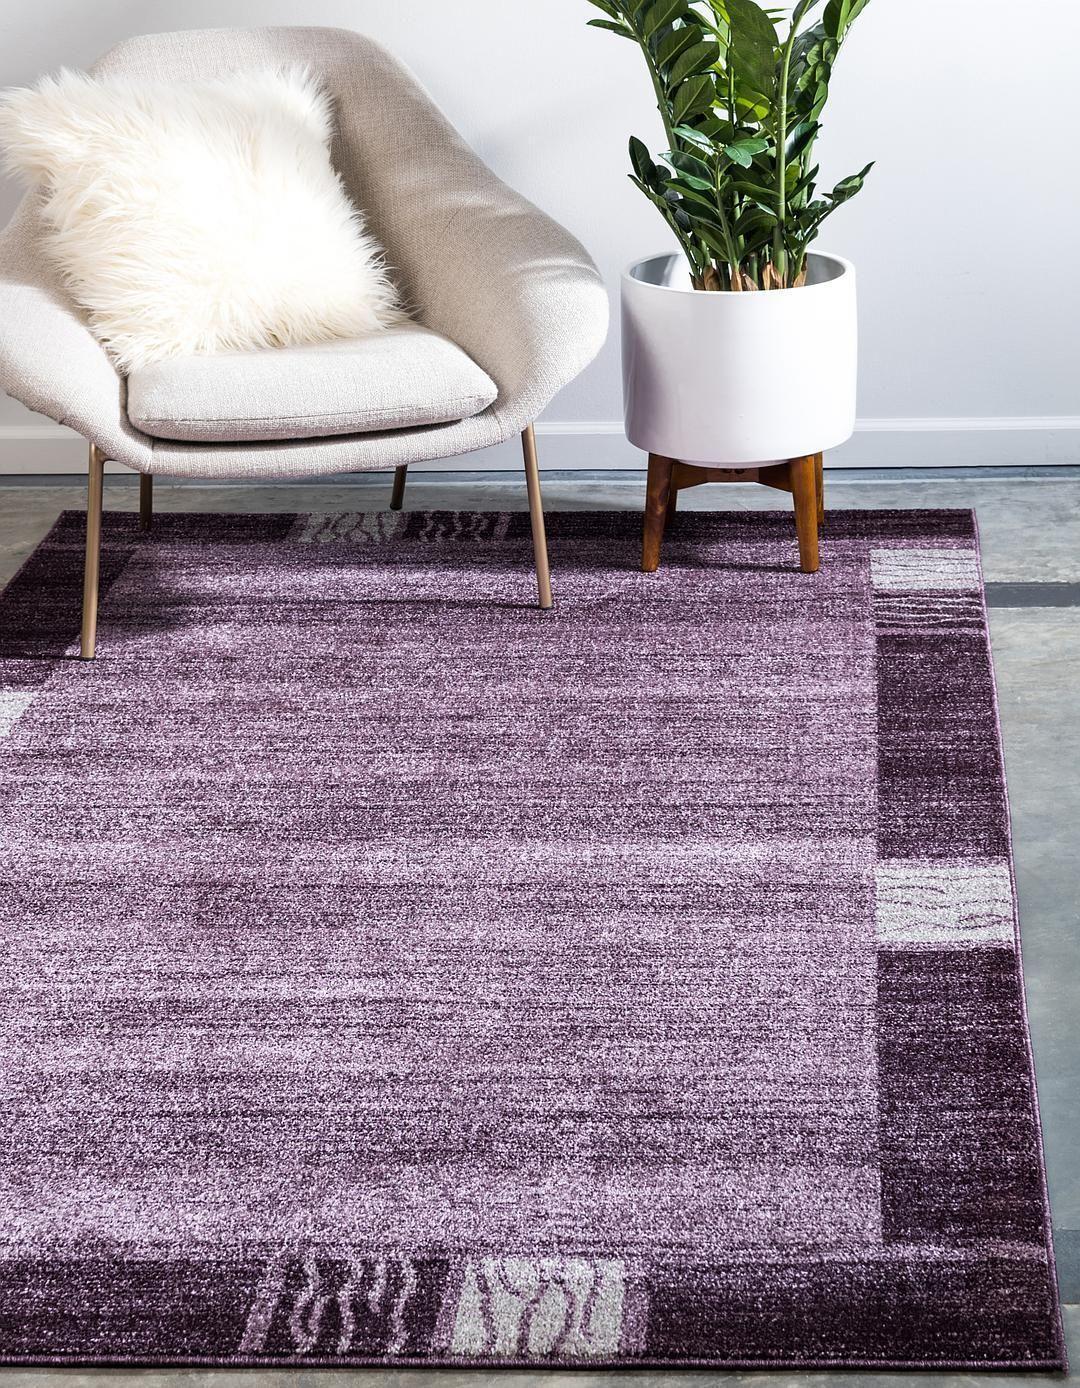 Purple 5 X 8 Loft Rug Area Rugs Esalerugs With Images